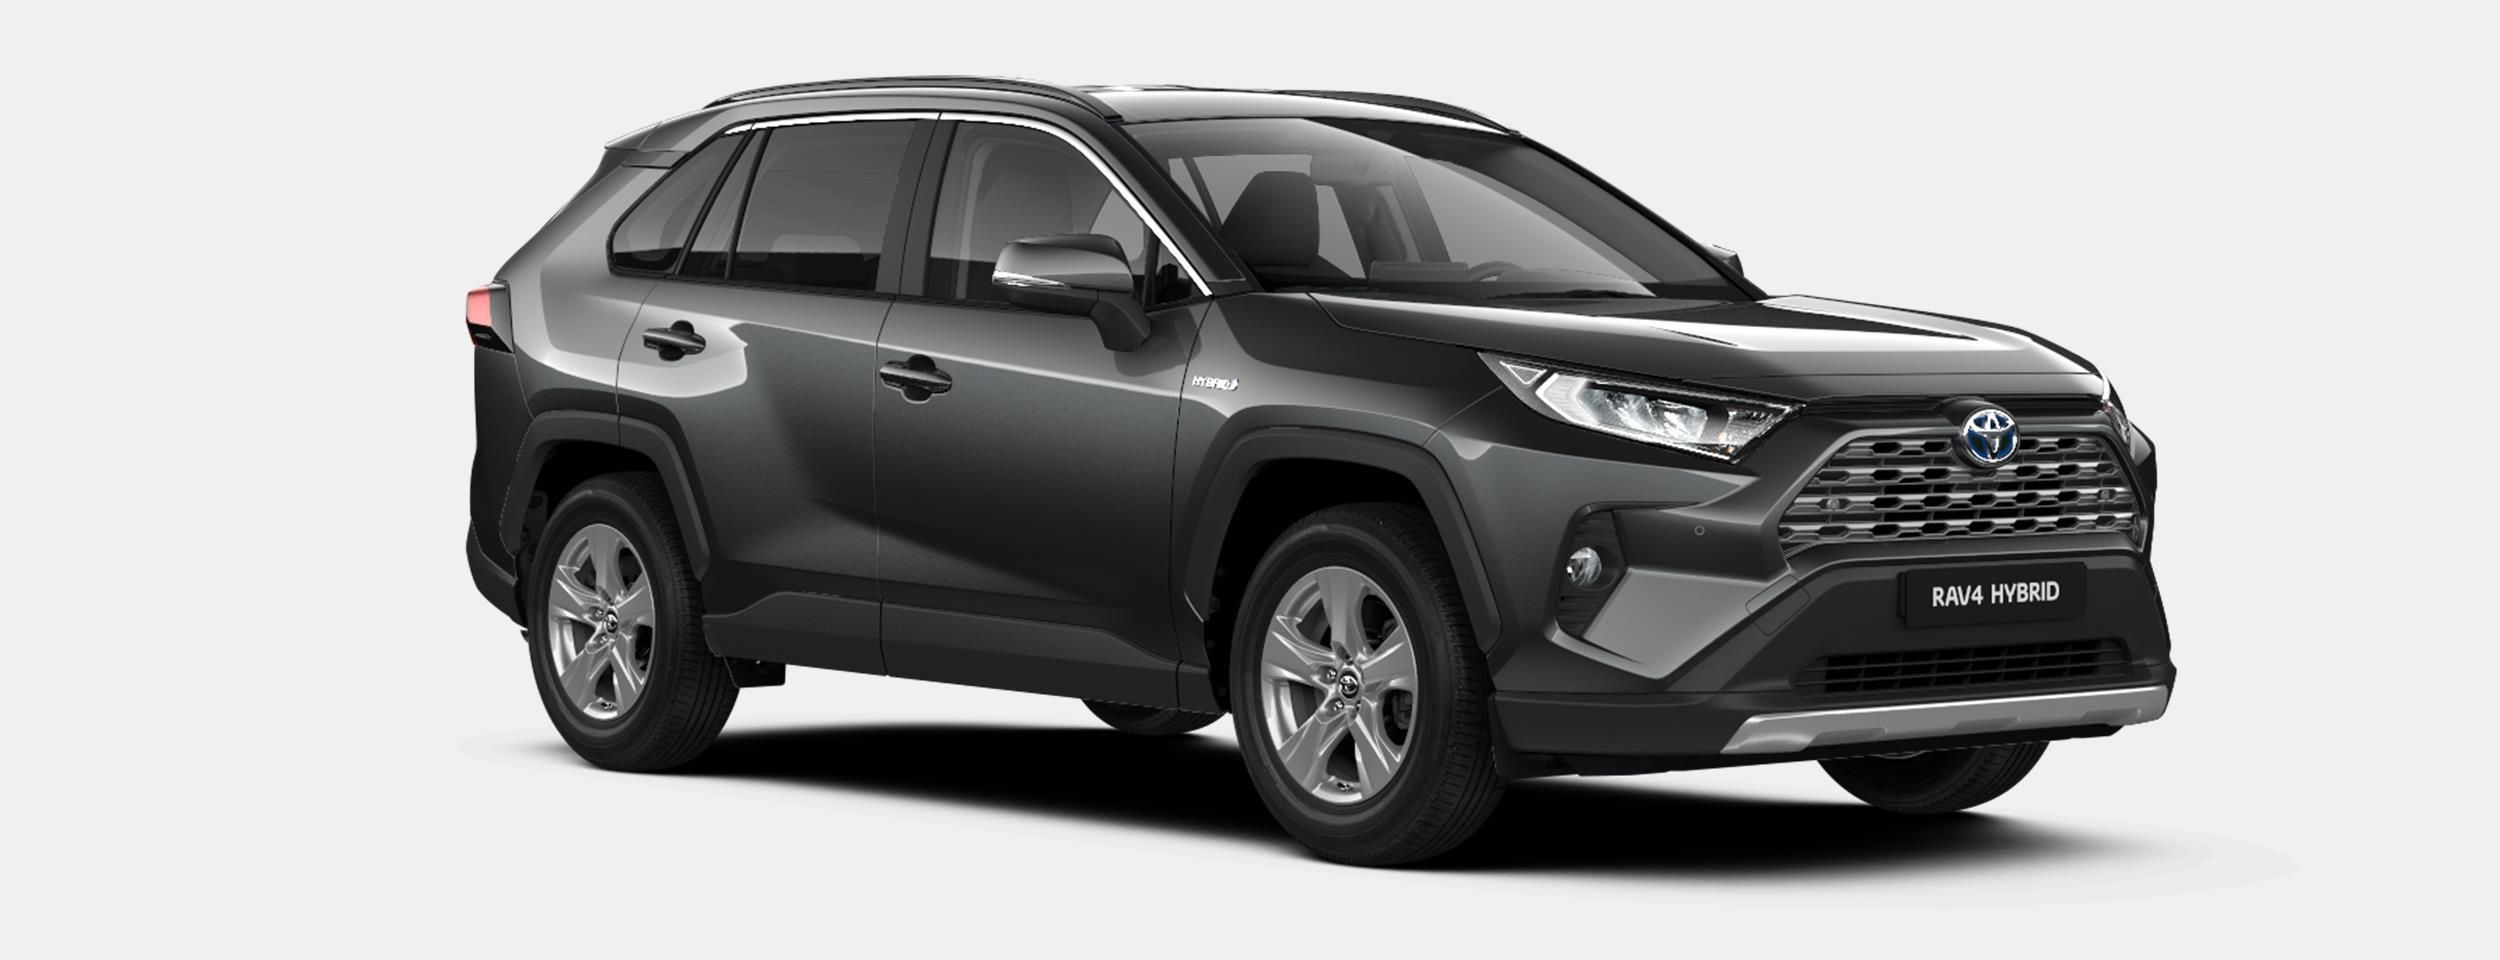 Nieuw Toyota Rav4 5 d. 2.5 Hybrid 2WD e-CVT Premium Plus L 1G3 - DARK GREY METALLIC 3